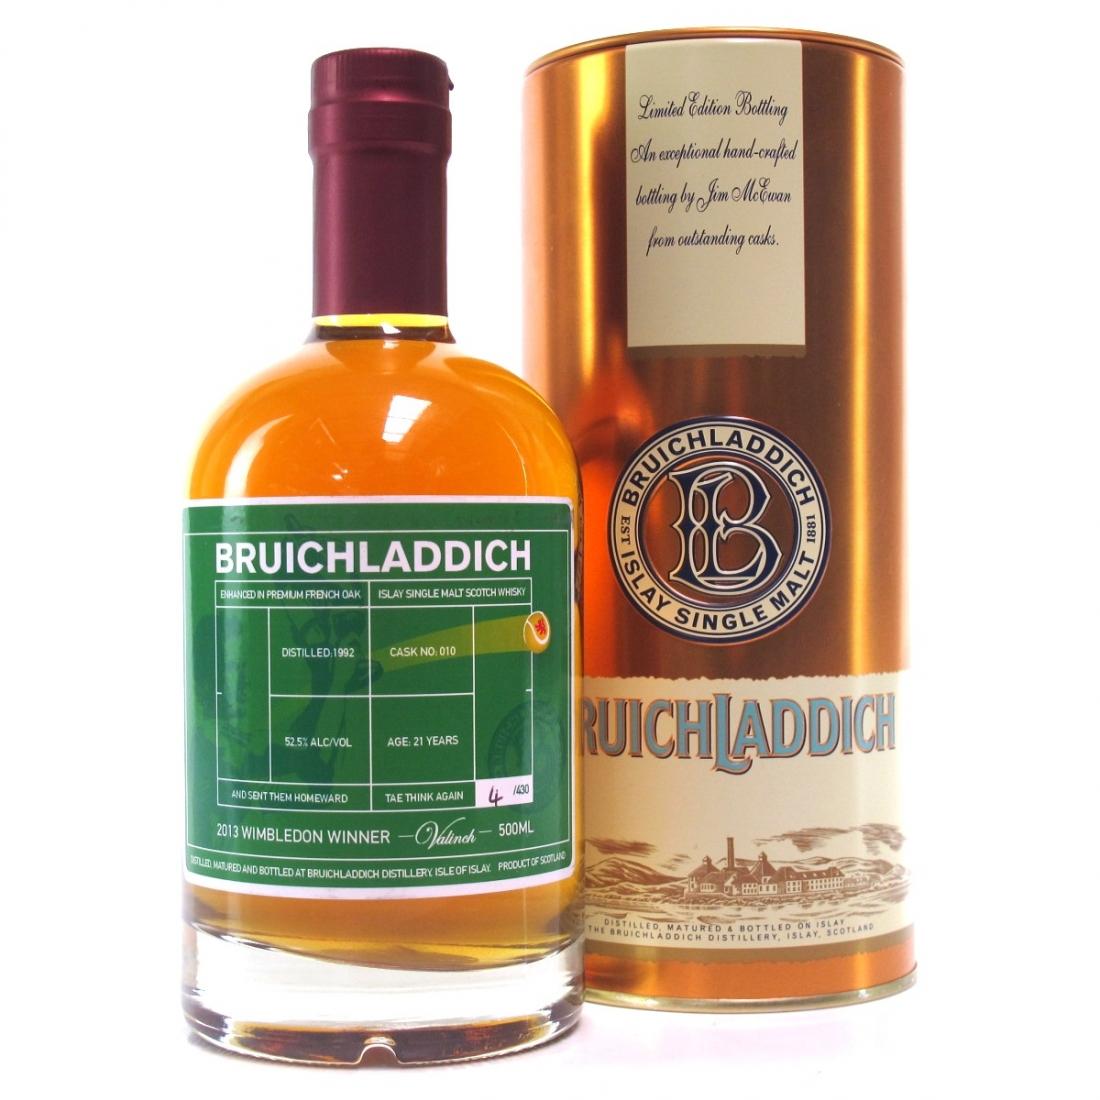 Bruichladdich 1992 Valinch / Wimbledon Winner 2013